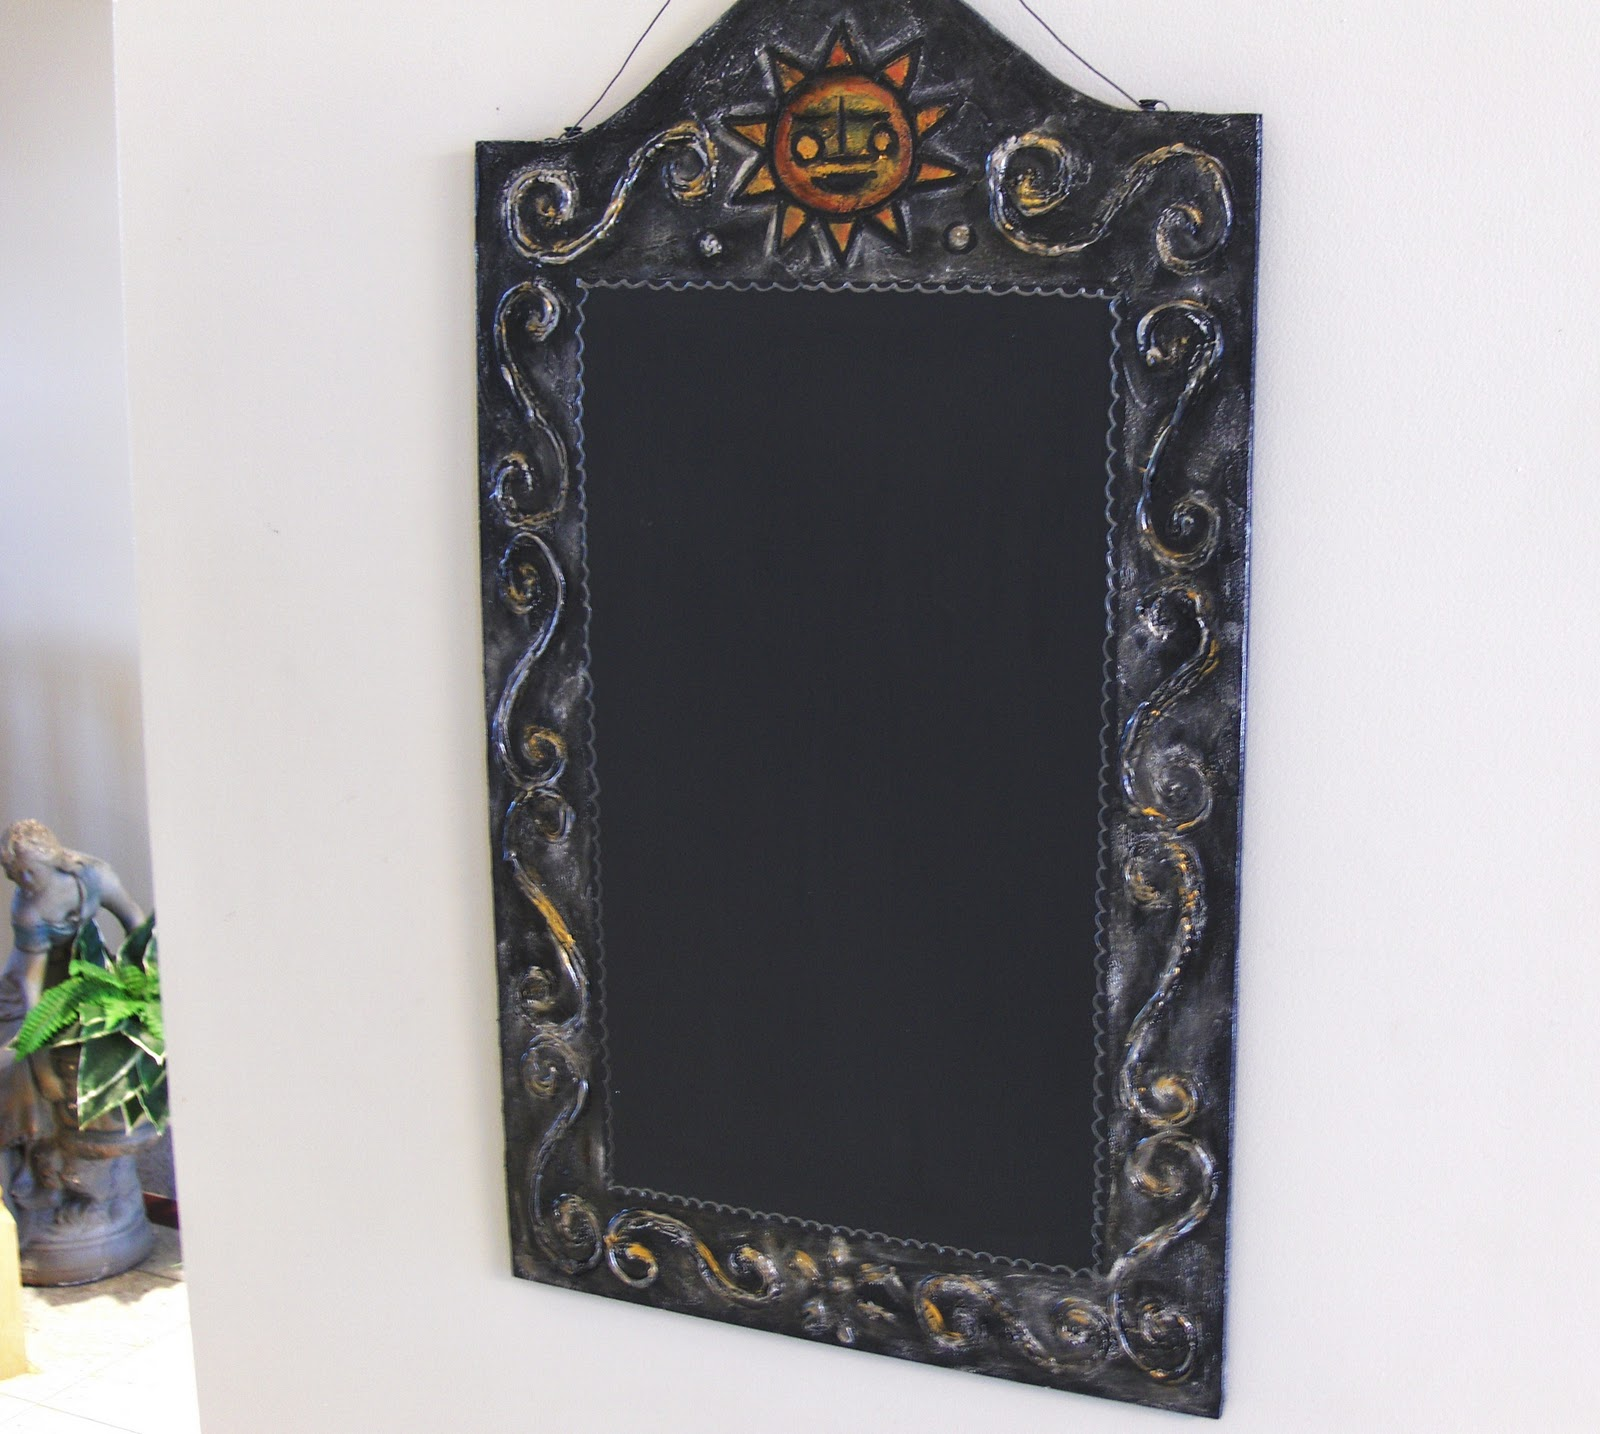 Decorative Chalkboards For Home: ZeeZee Chalkboards * Classy Custom Chalkboards For Home